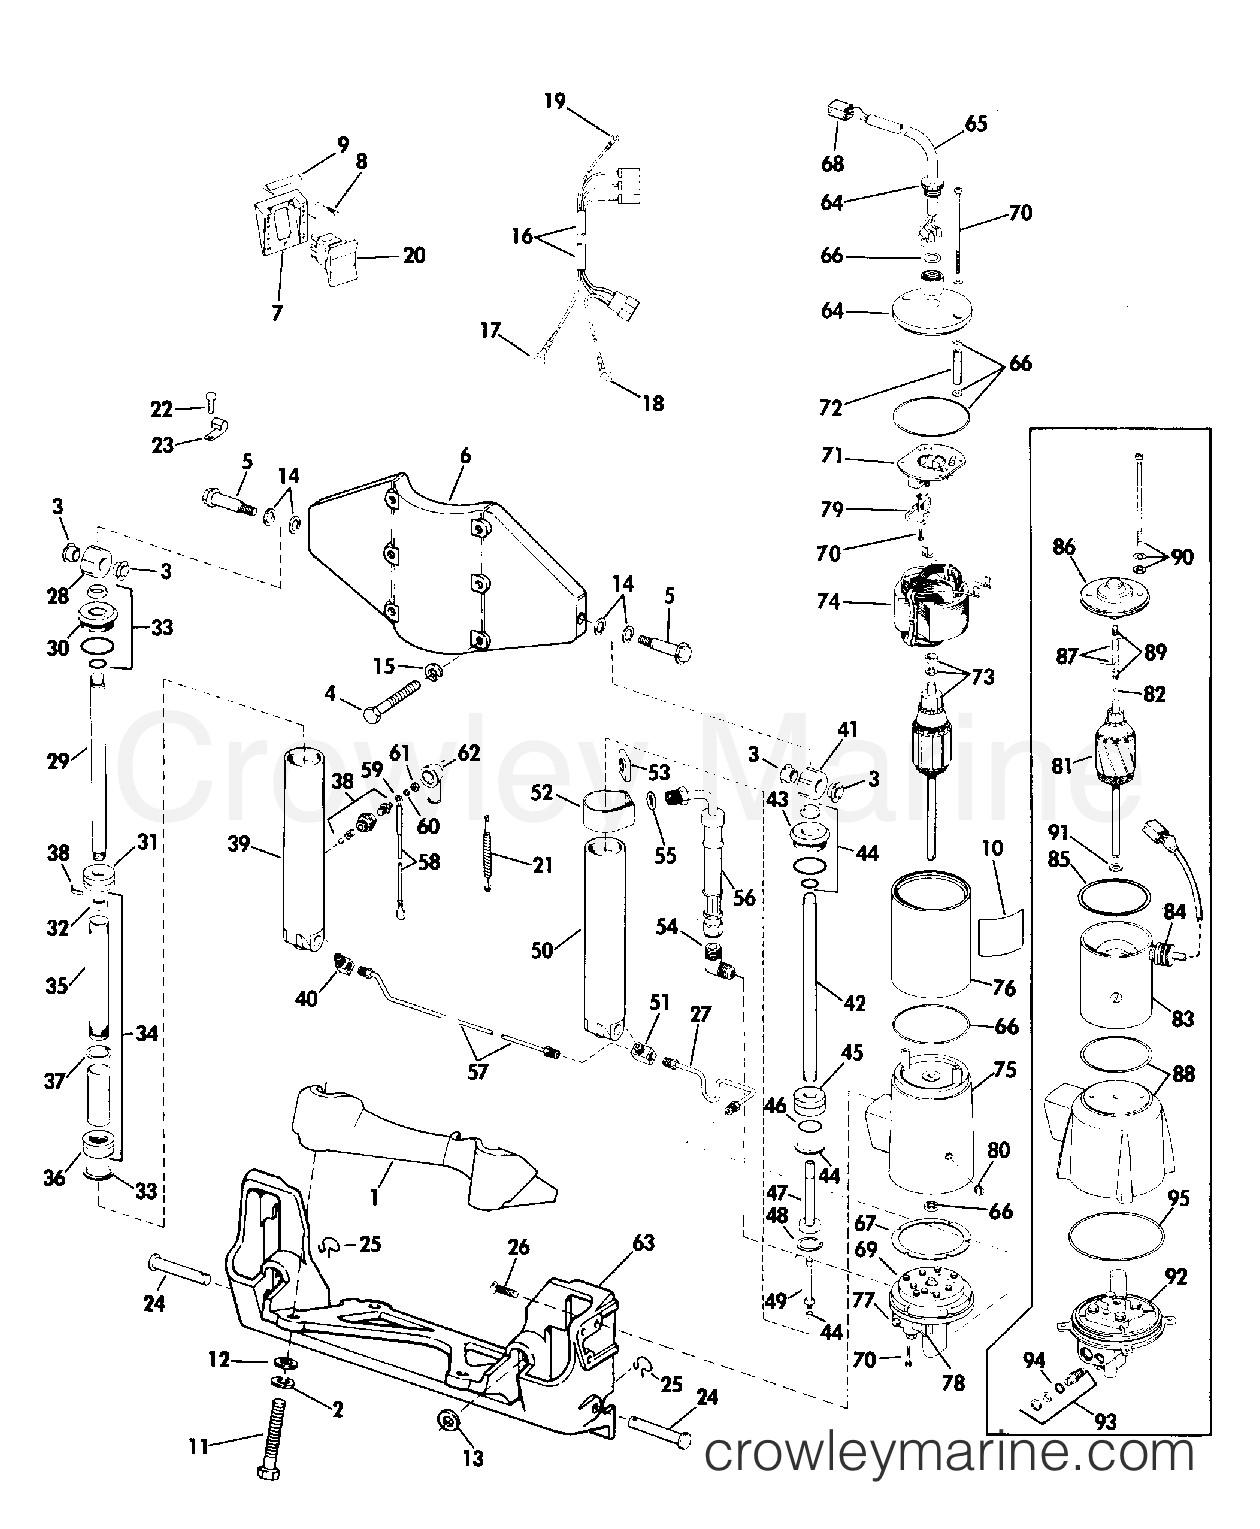 evinrude 15 hp parts diagram power tilt and trim 50 hp